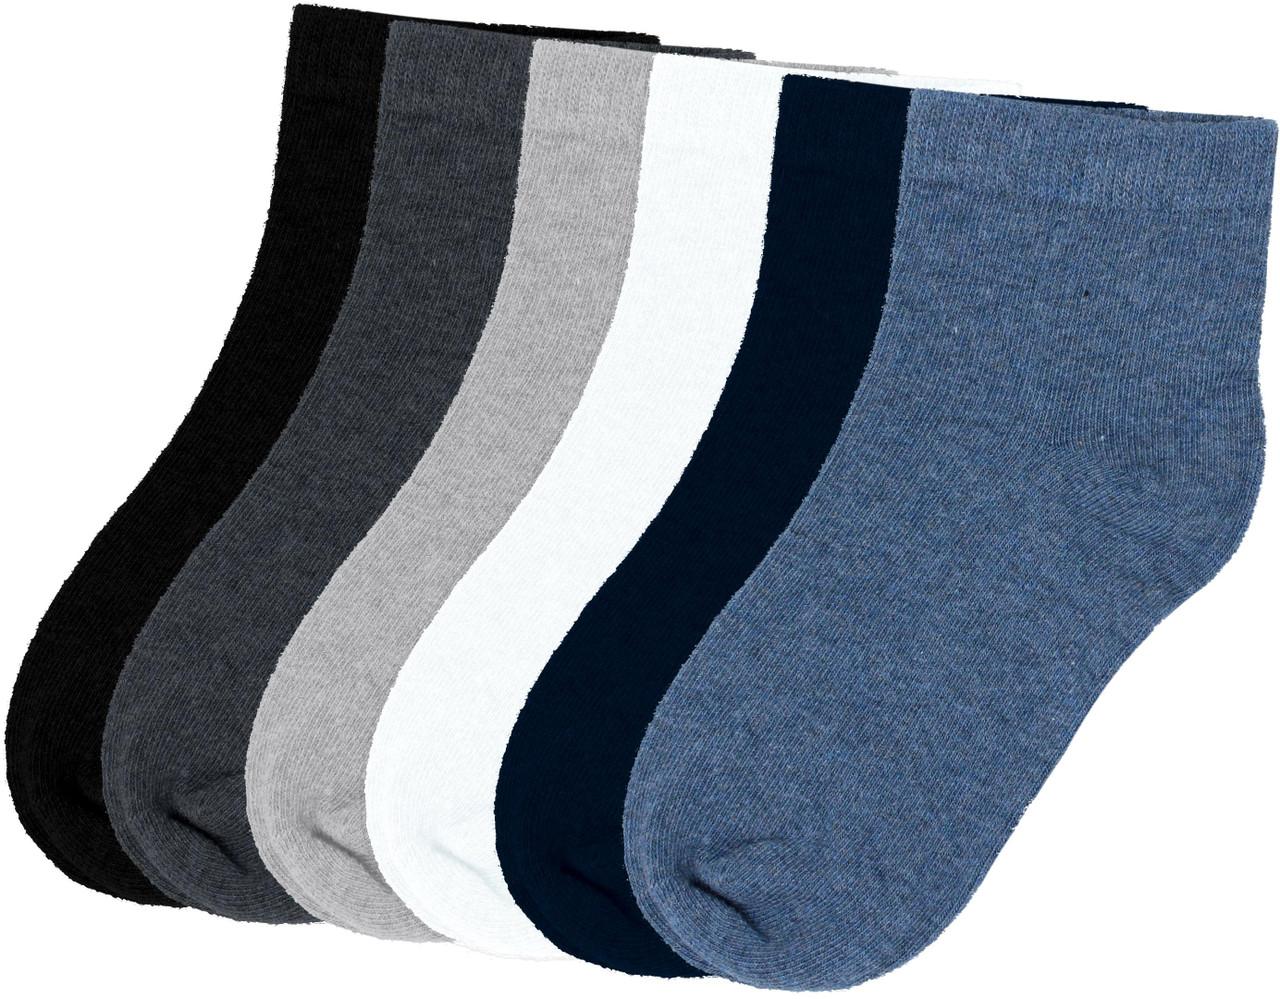 Trimfit Childrens Unisex Boys Girls Low Cut Comfortoe Socks 3 Pack